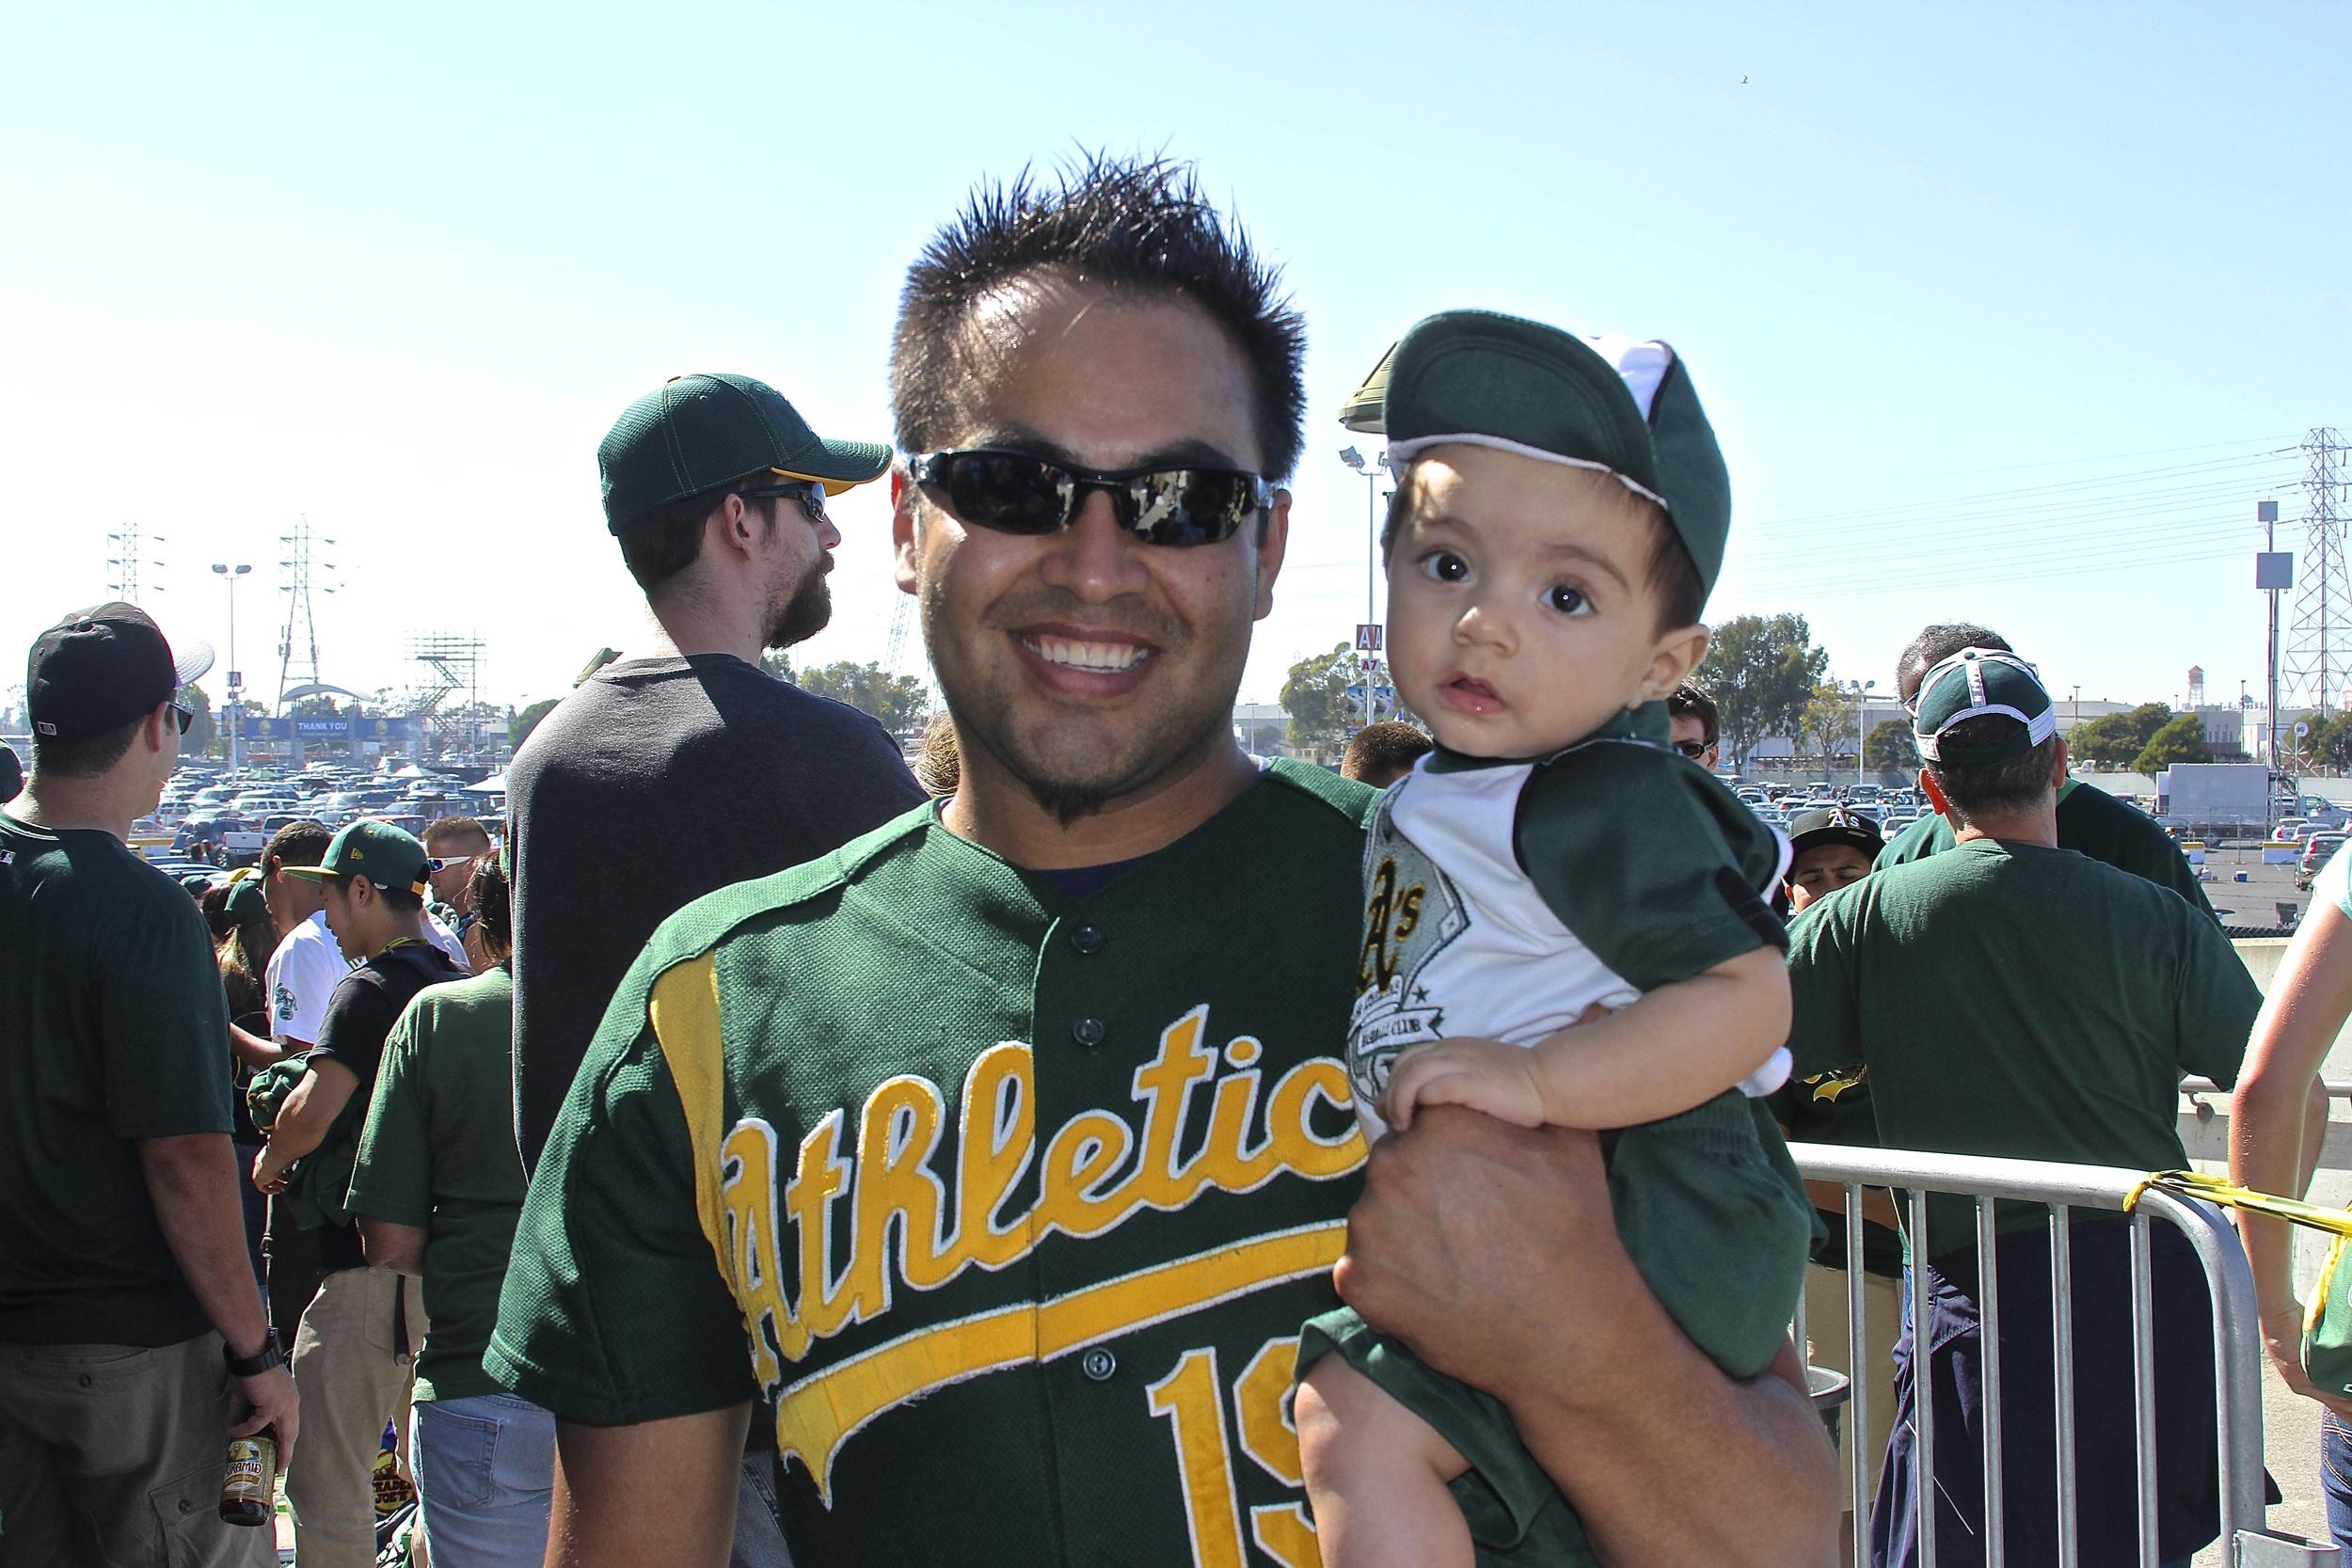 Rafael and his son outside of O.Co